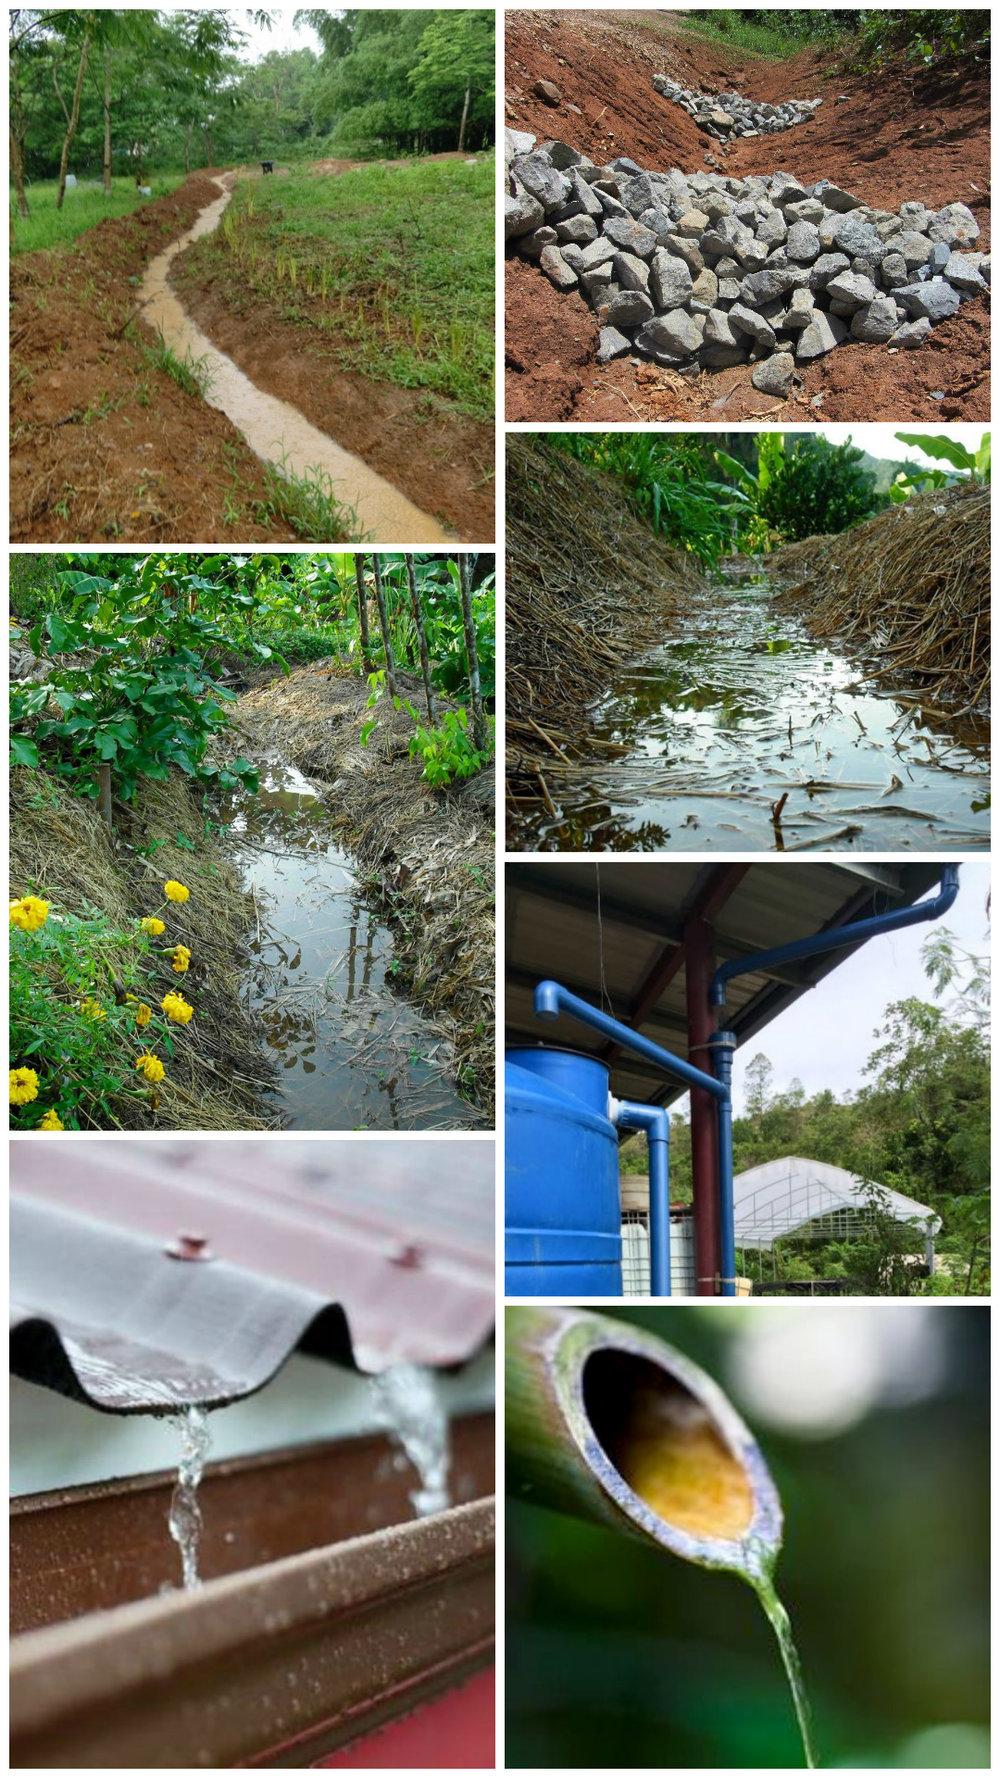 25. Opcional para el final_ Collage de fotos de agua - sec 2.jpg